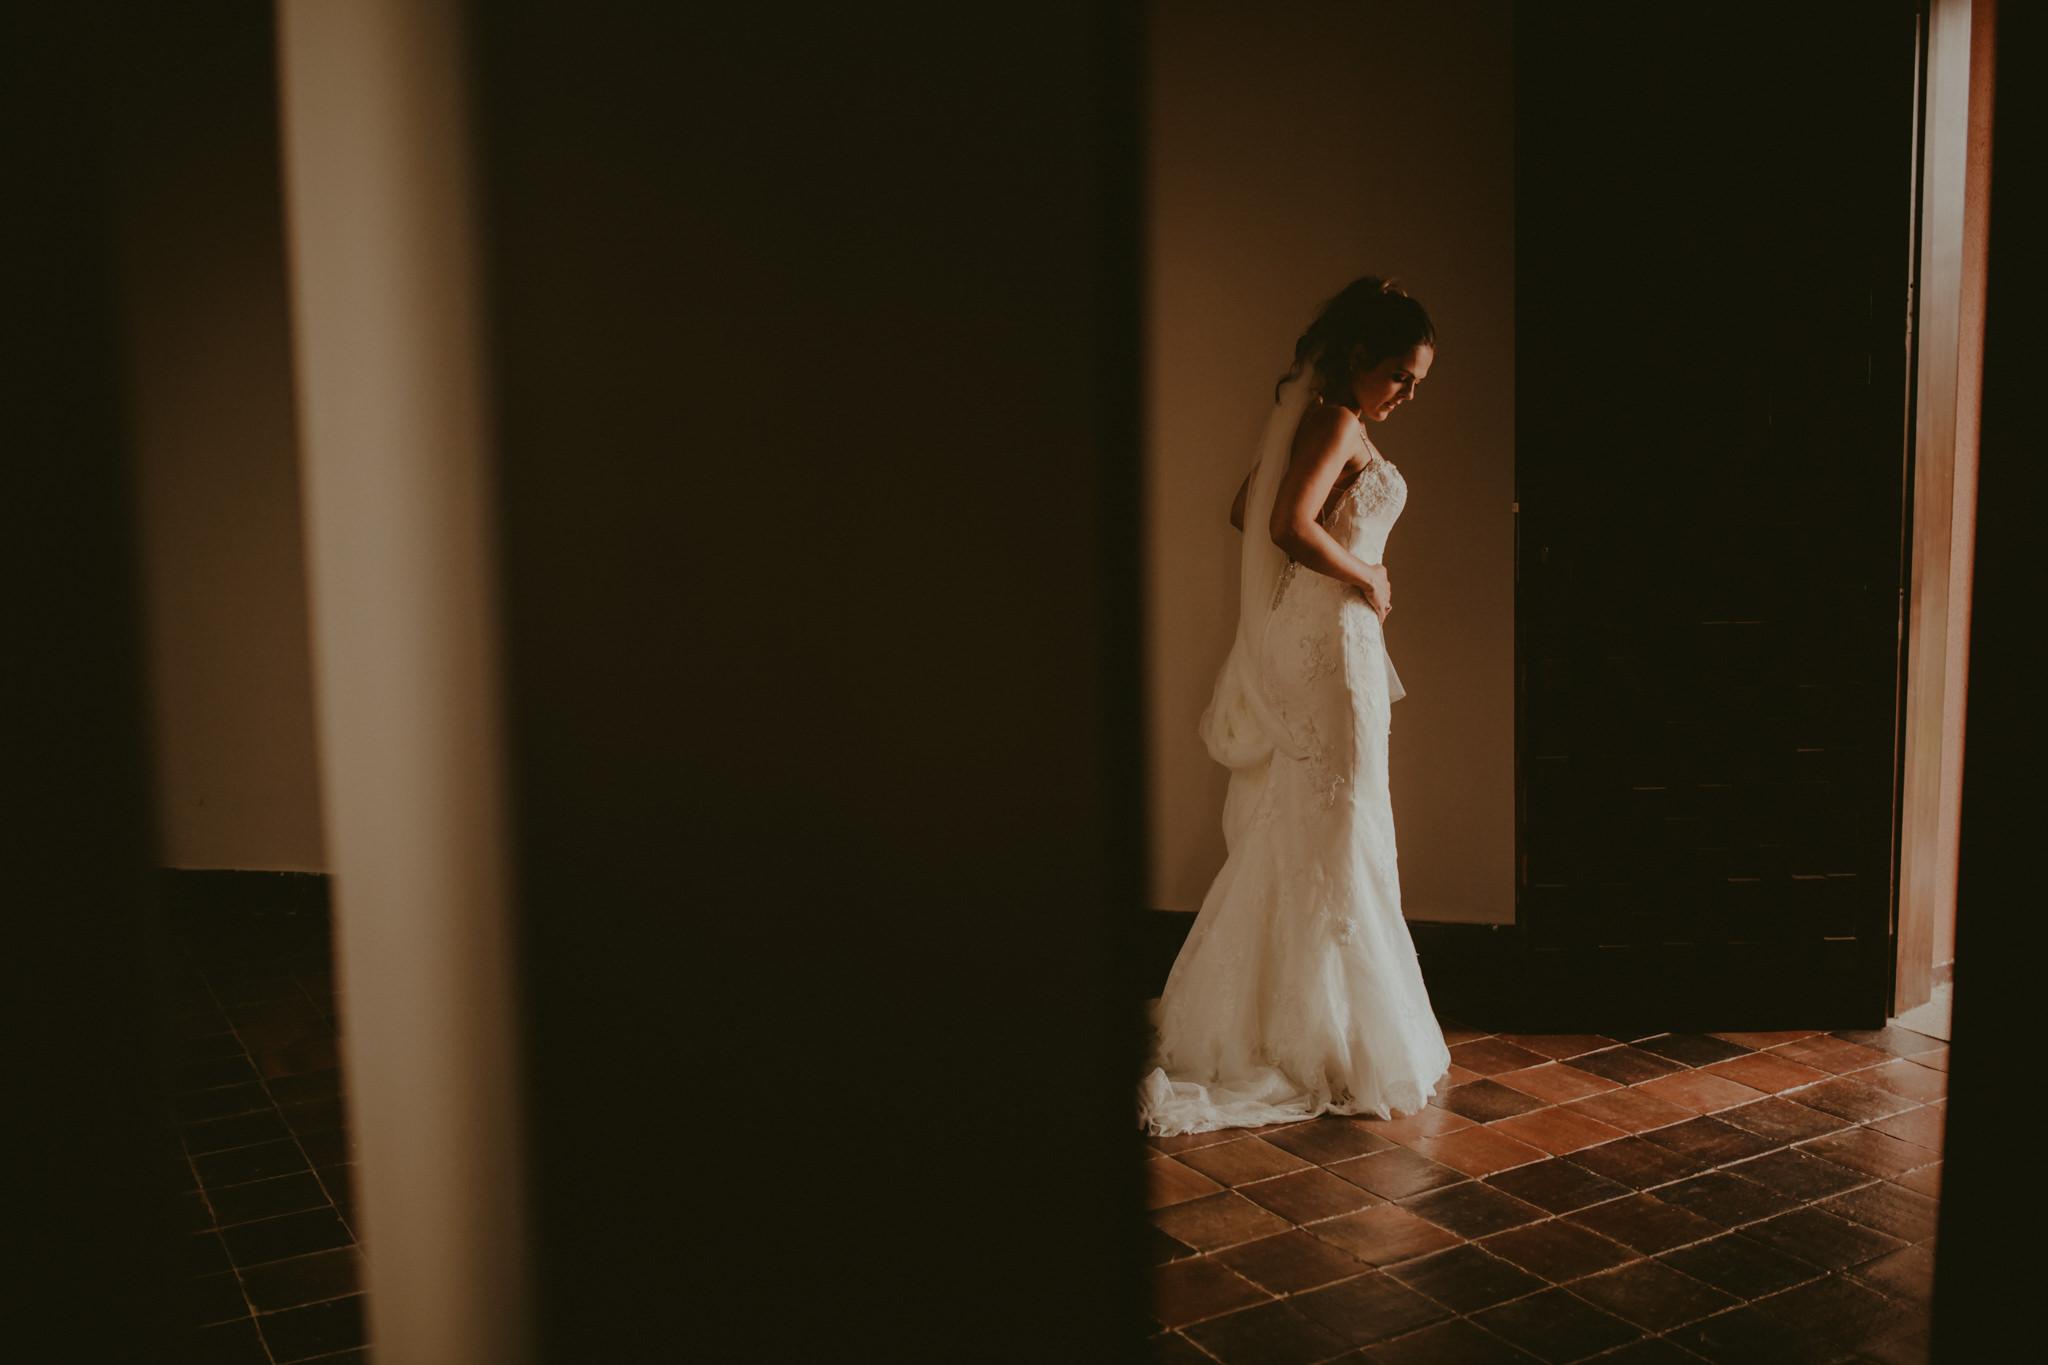 boda-diferente-fotografo-boda-laspalmas-grancanaria-23